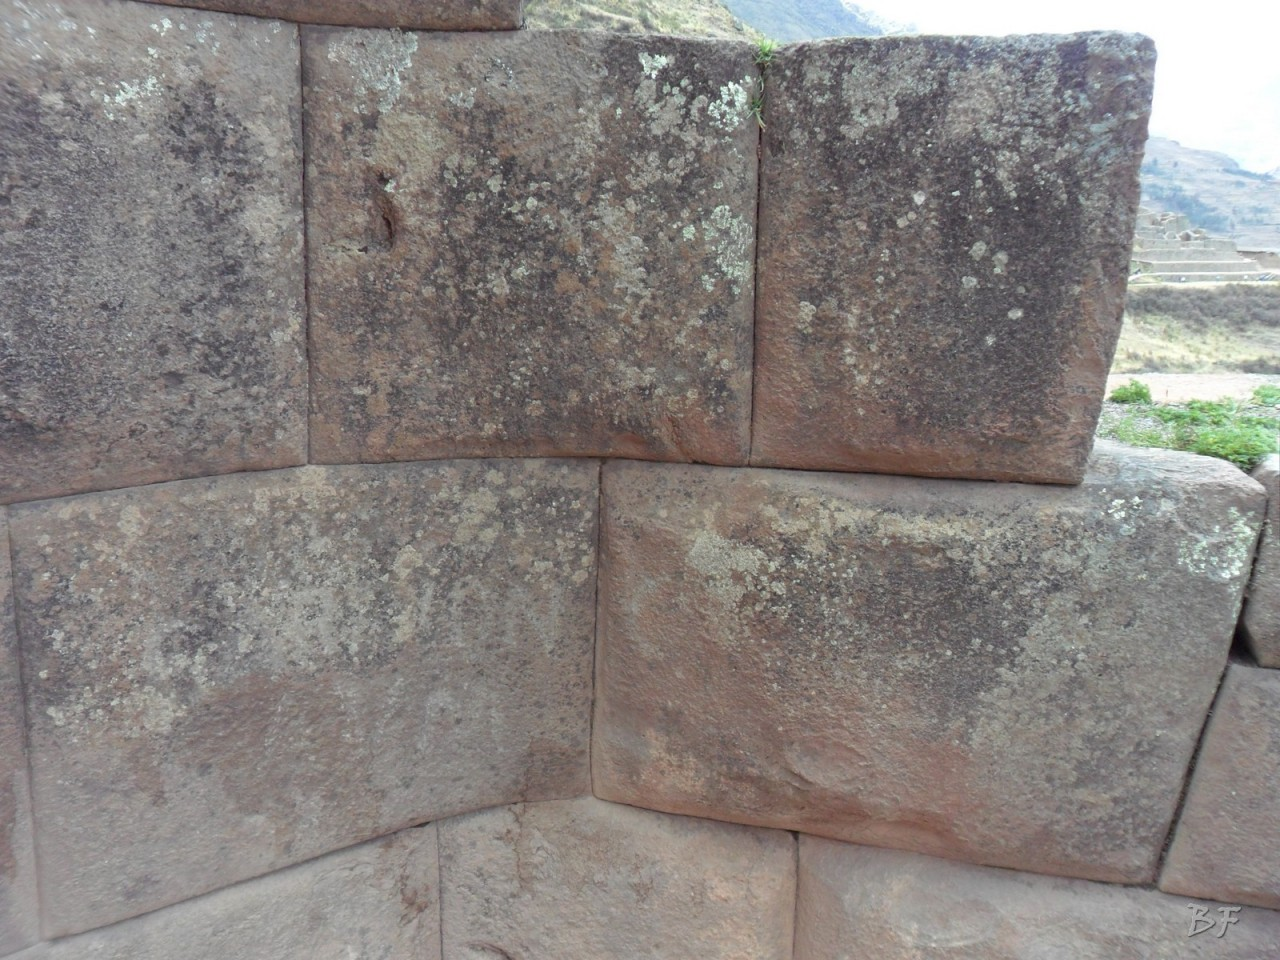 Mura-Poligonali-Megaliti-Altari-Rupestri-Pisac-Cusco-Perù-30